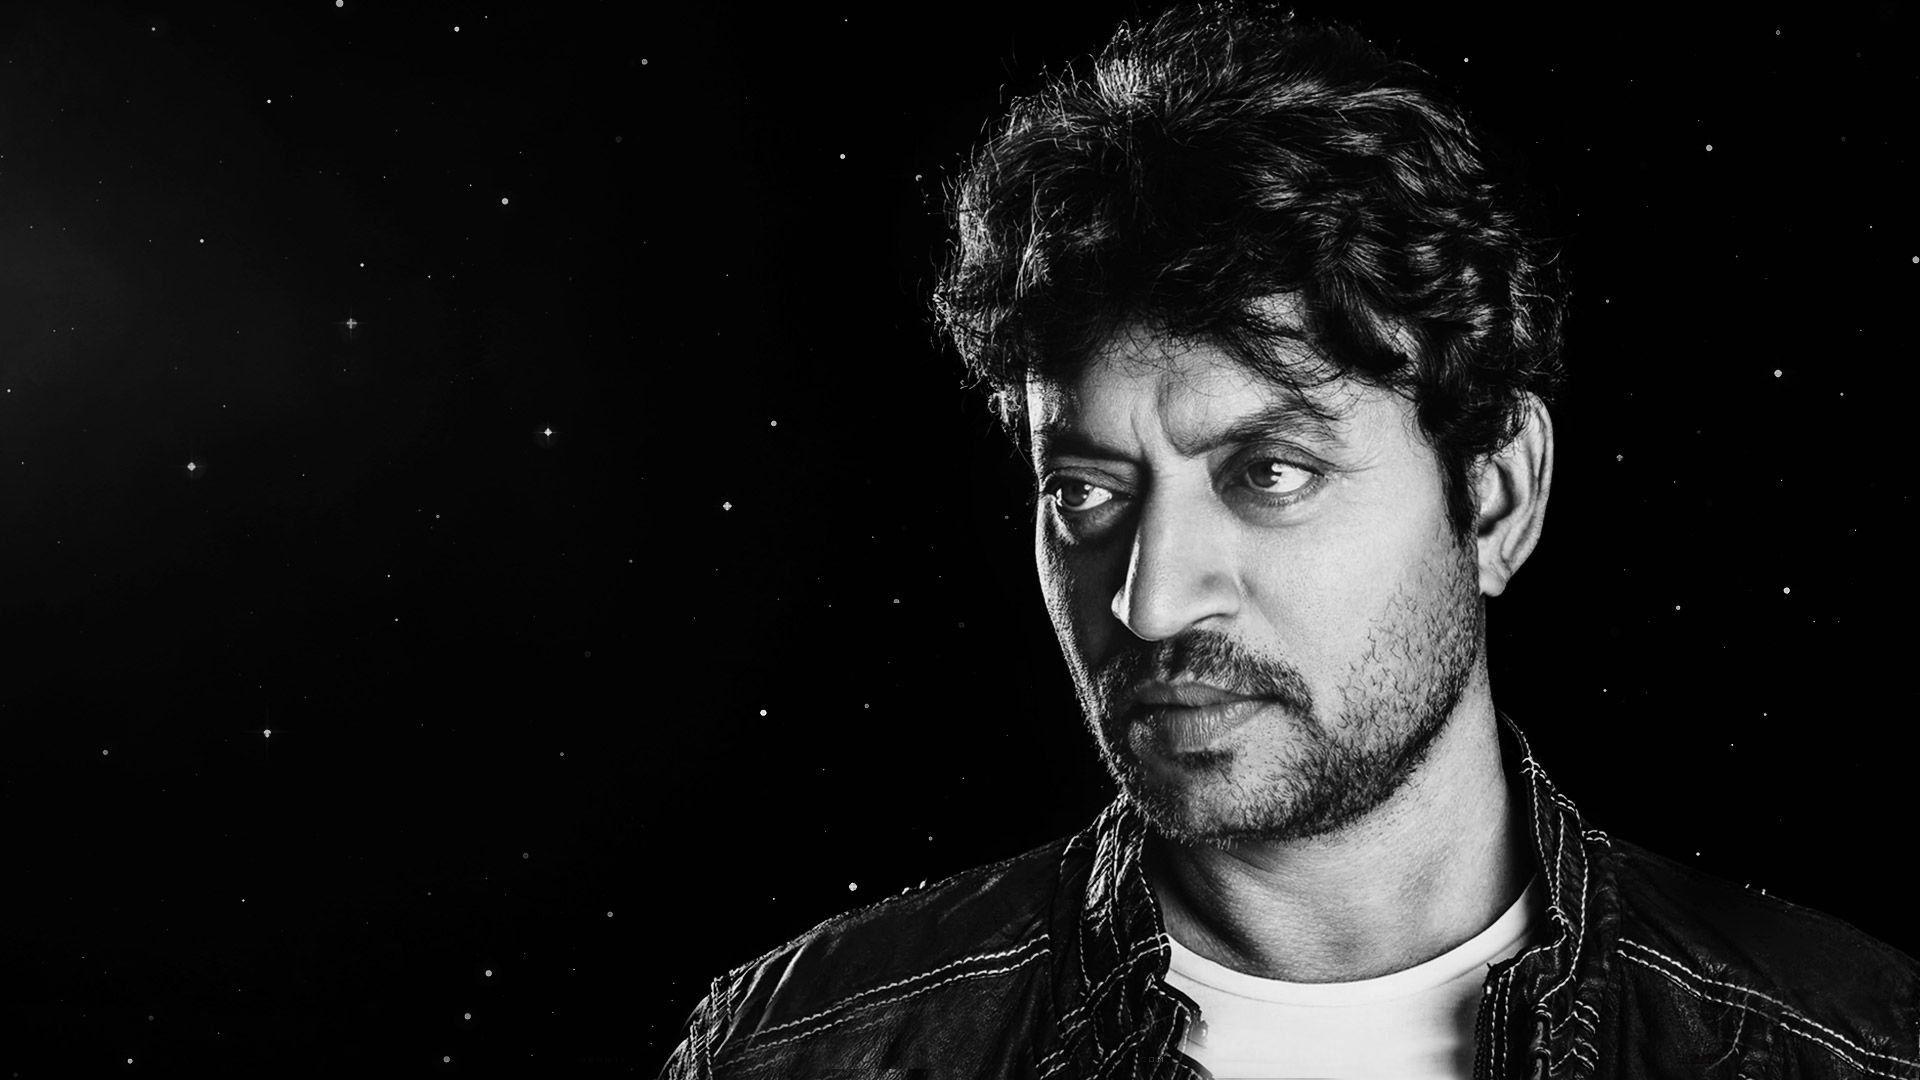 fotografía del actor irrfan khan